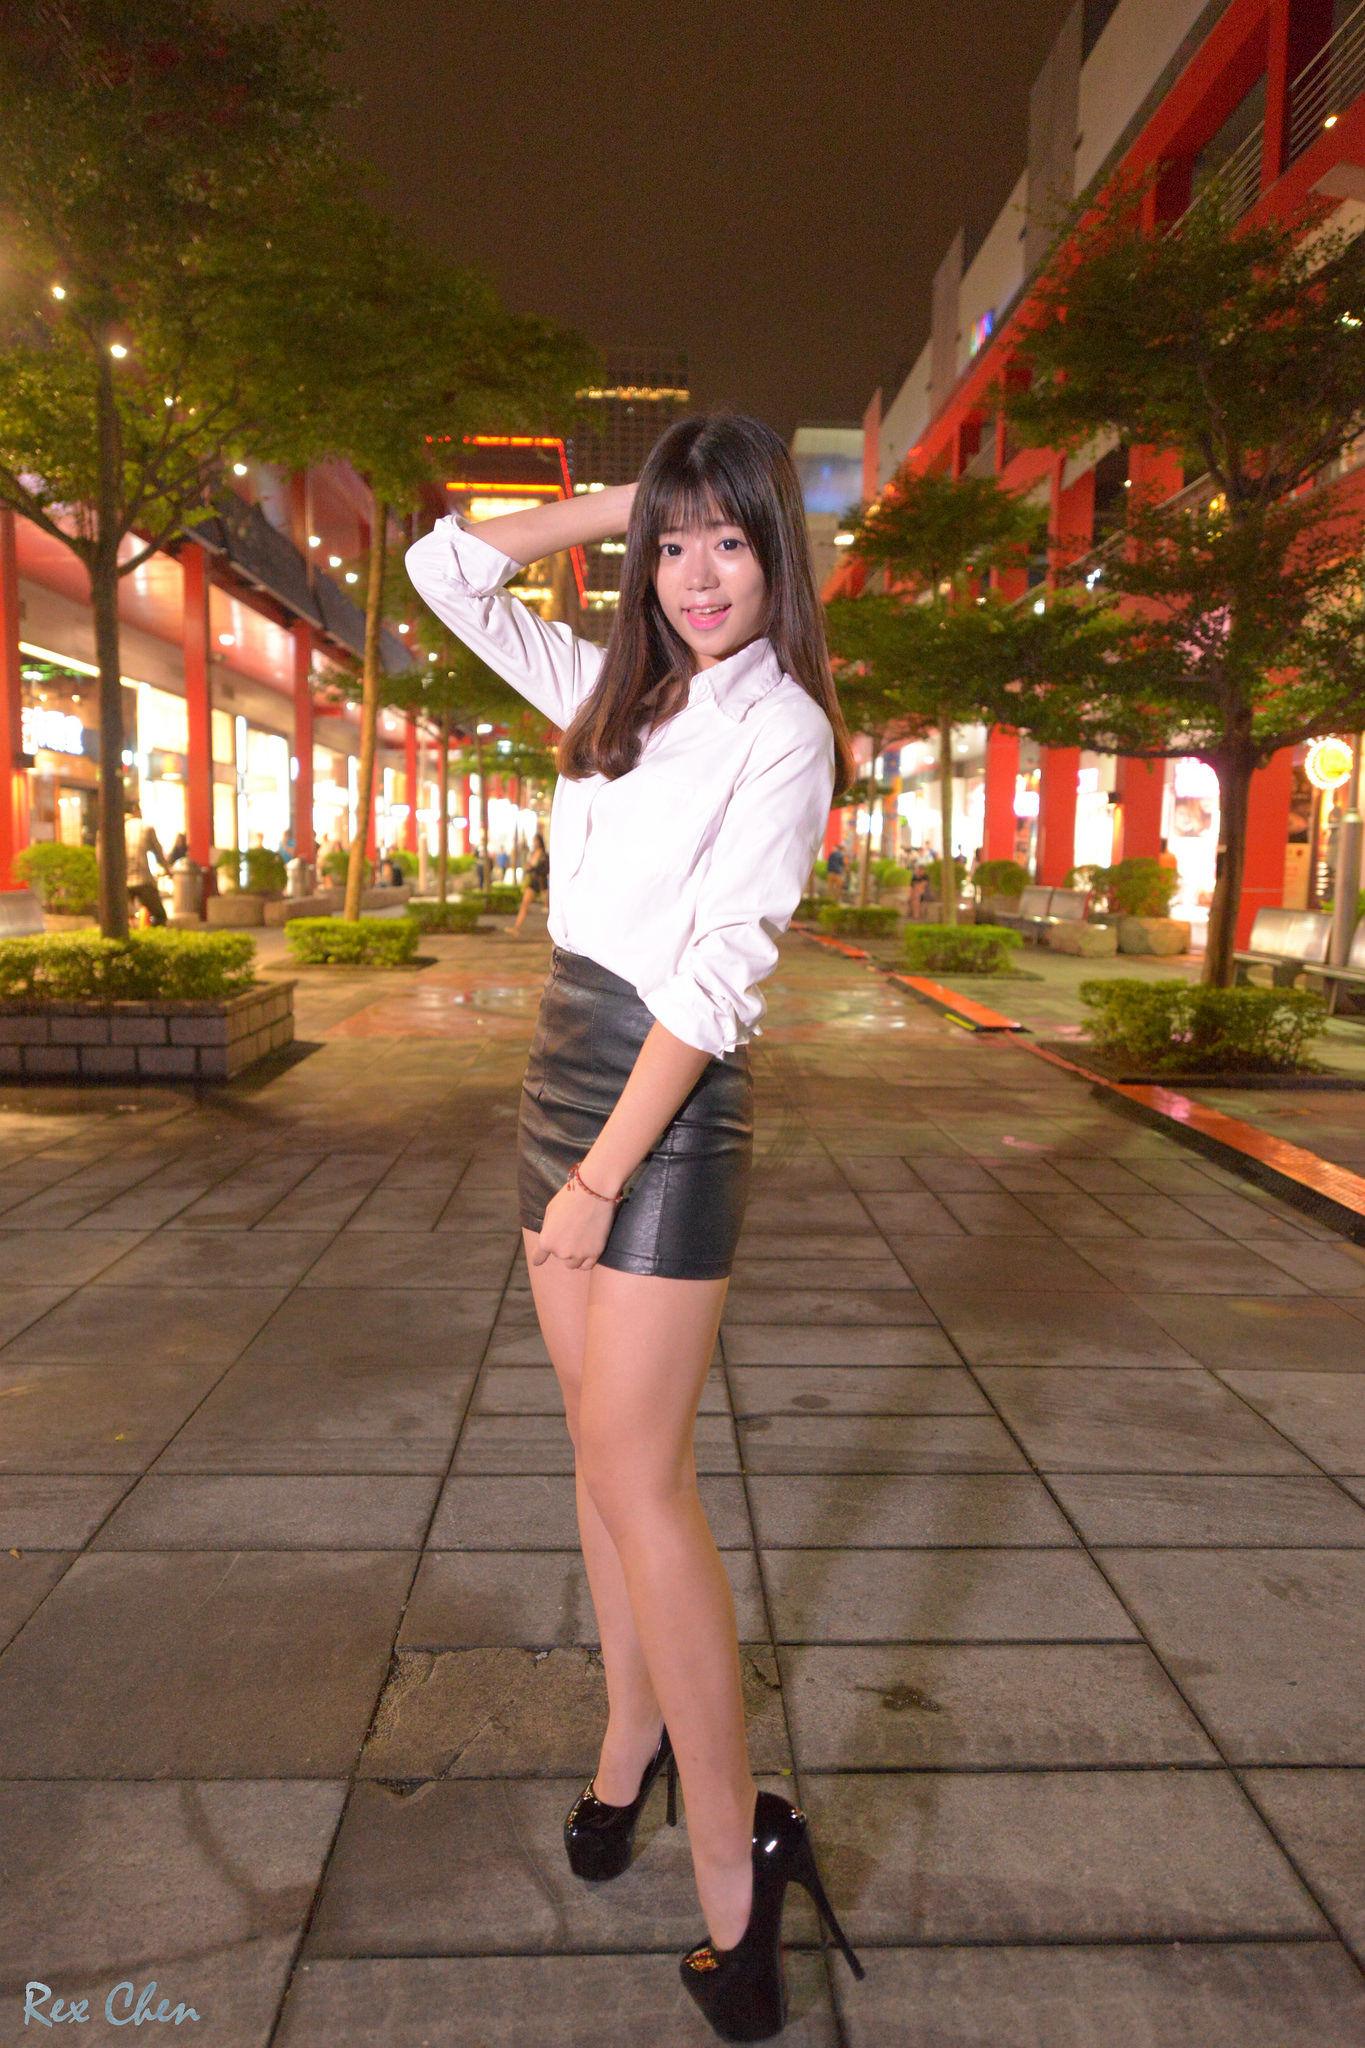 VOL.914 [台湾正妹]街拍丝袜美腿OL美女:比比儿(Katie Chiu)超高清个人性感漂亮大图(31P)